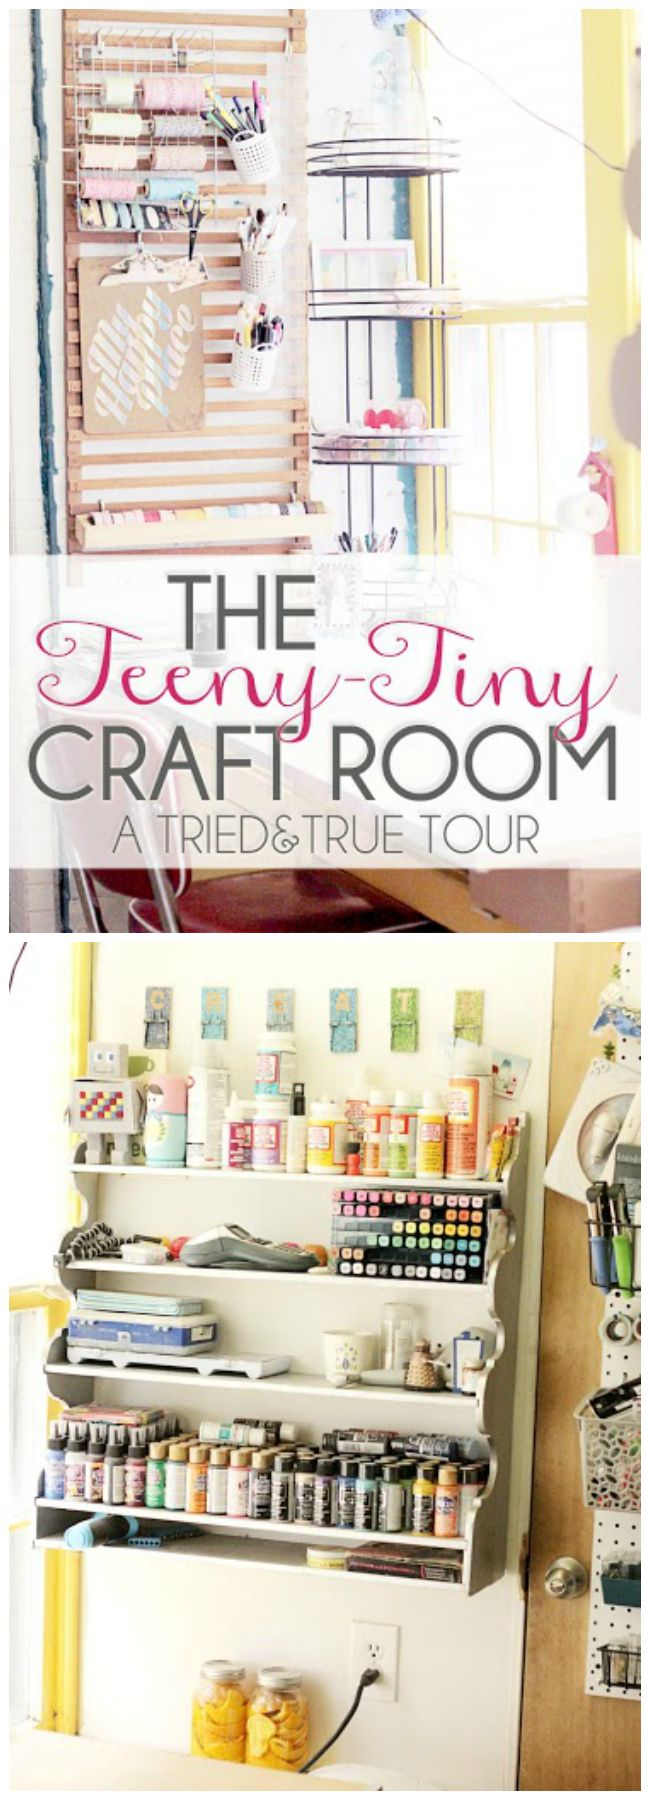 Small Craft Room TOUR - Vanessa at Tried & True Blog